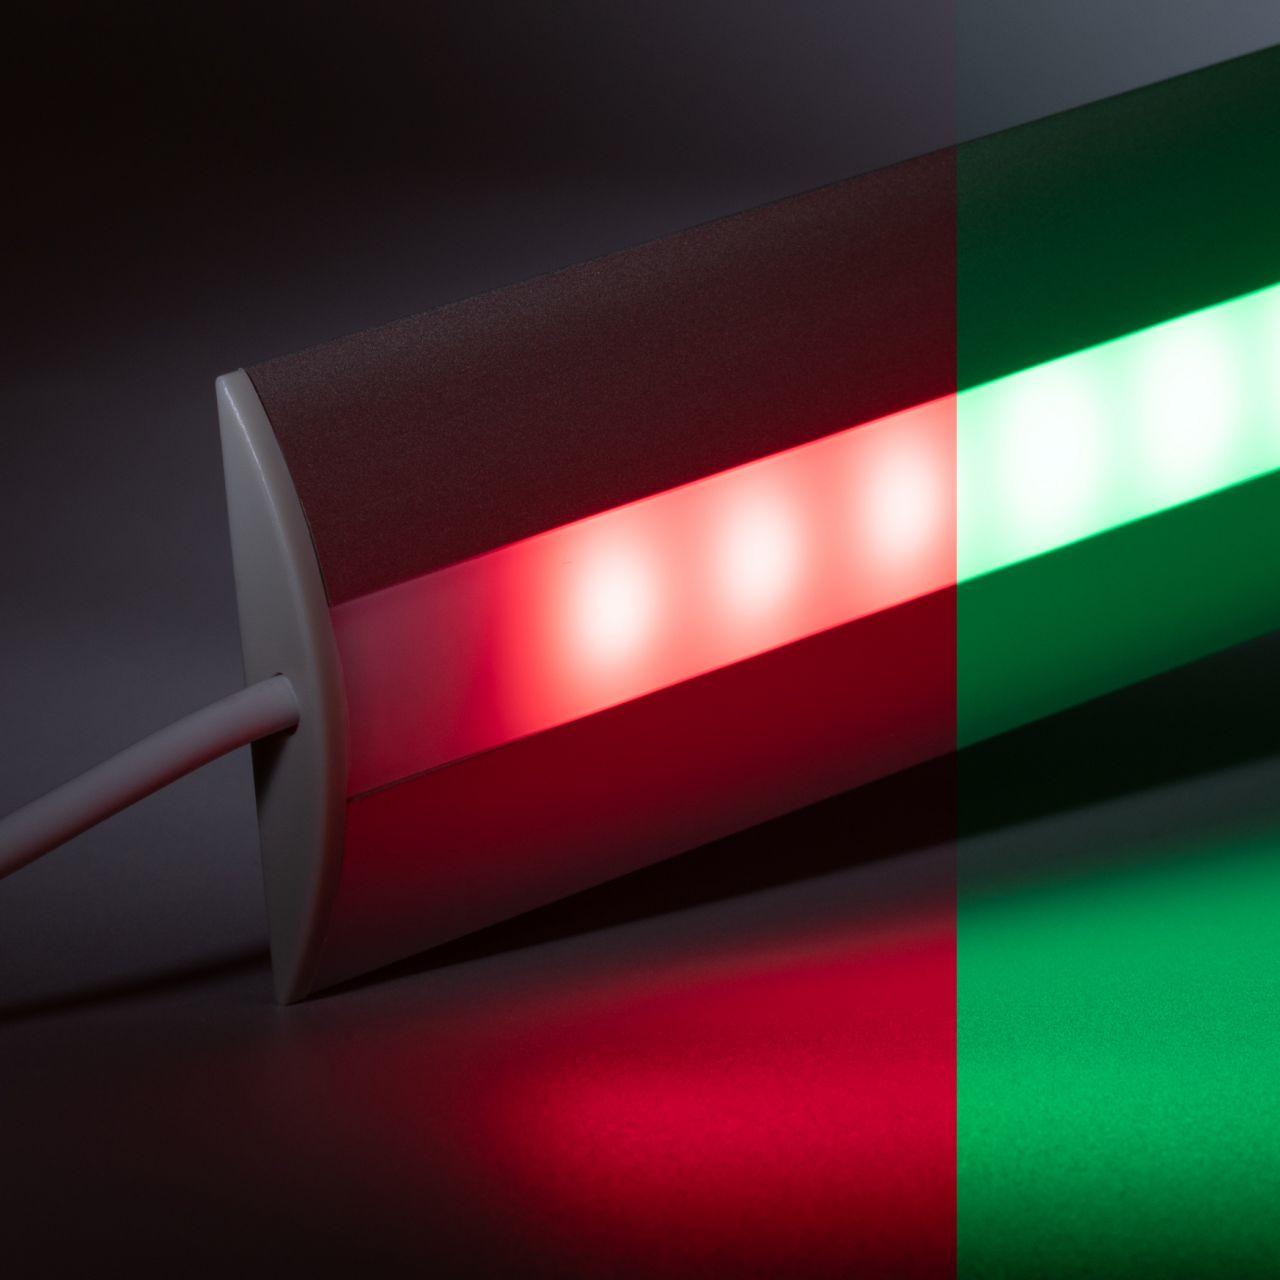 12V Aluminium Türschwellen LED Leiste - RGB - diffuse Abdeckung